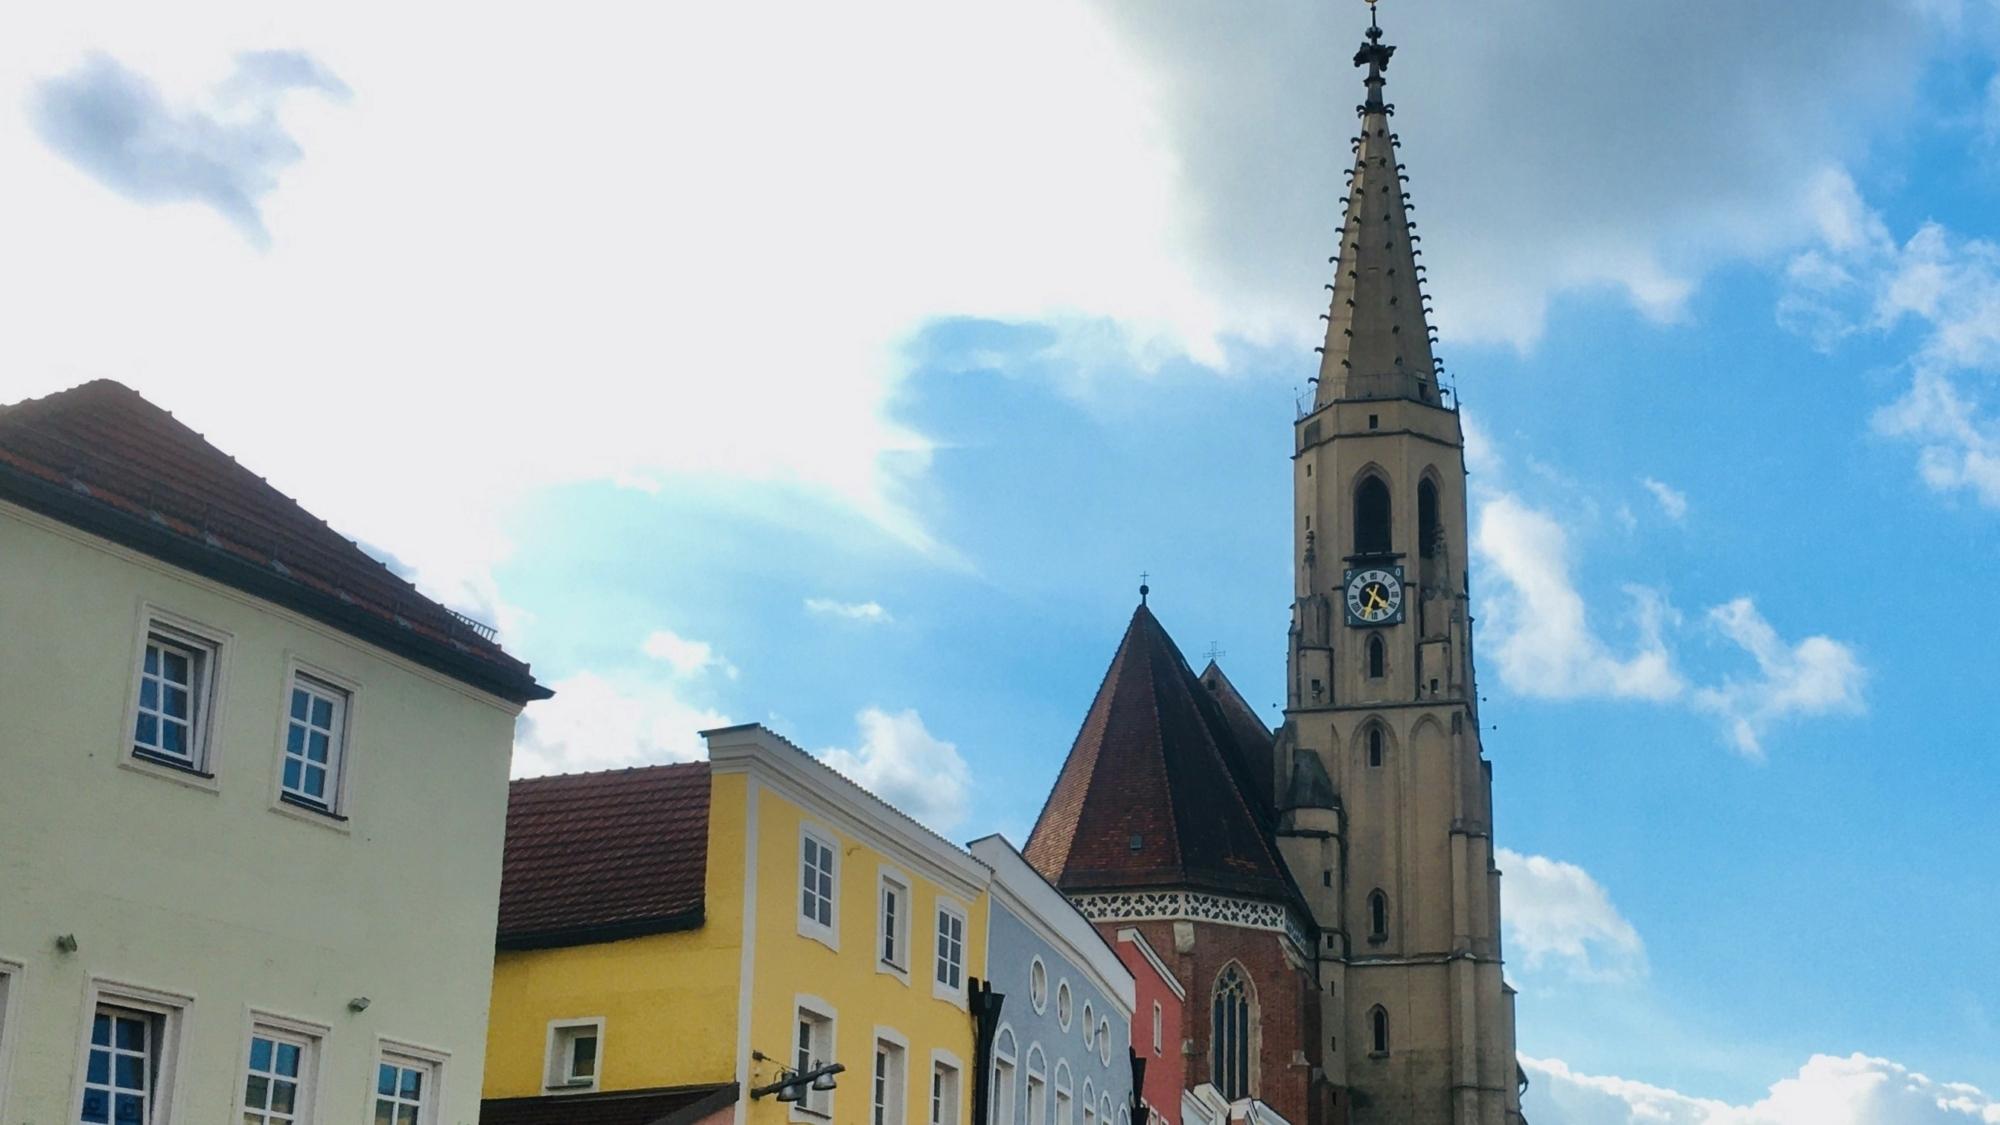 Stadtpfarrkirche Neuoetting